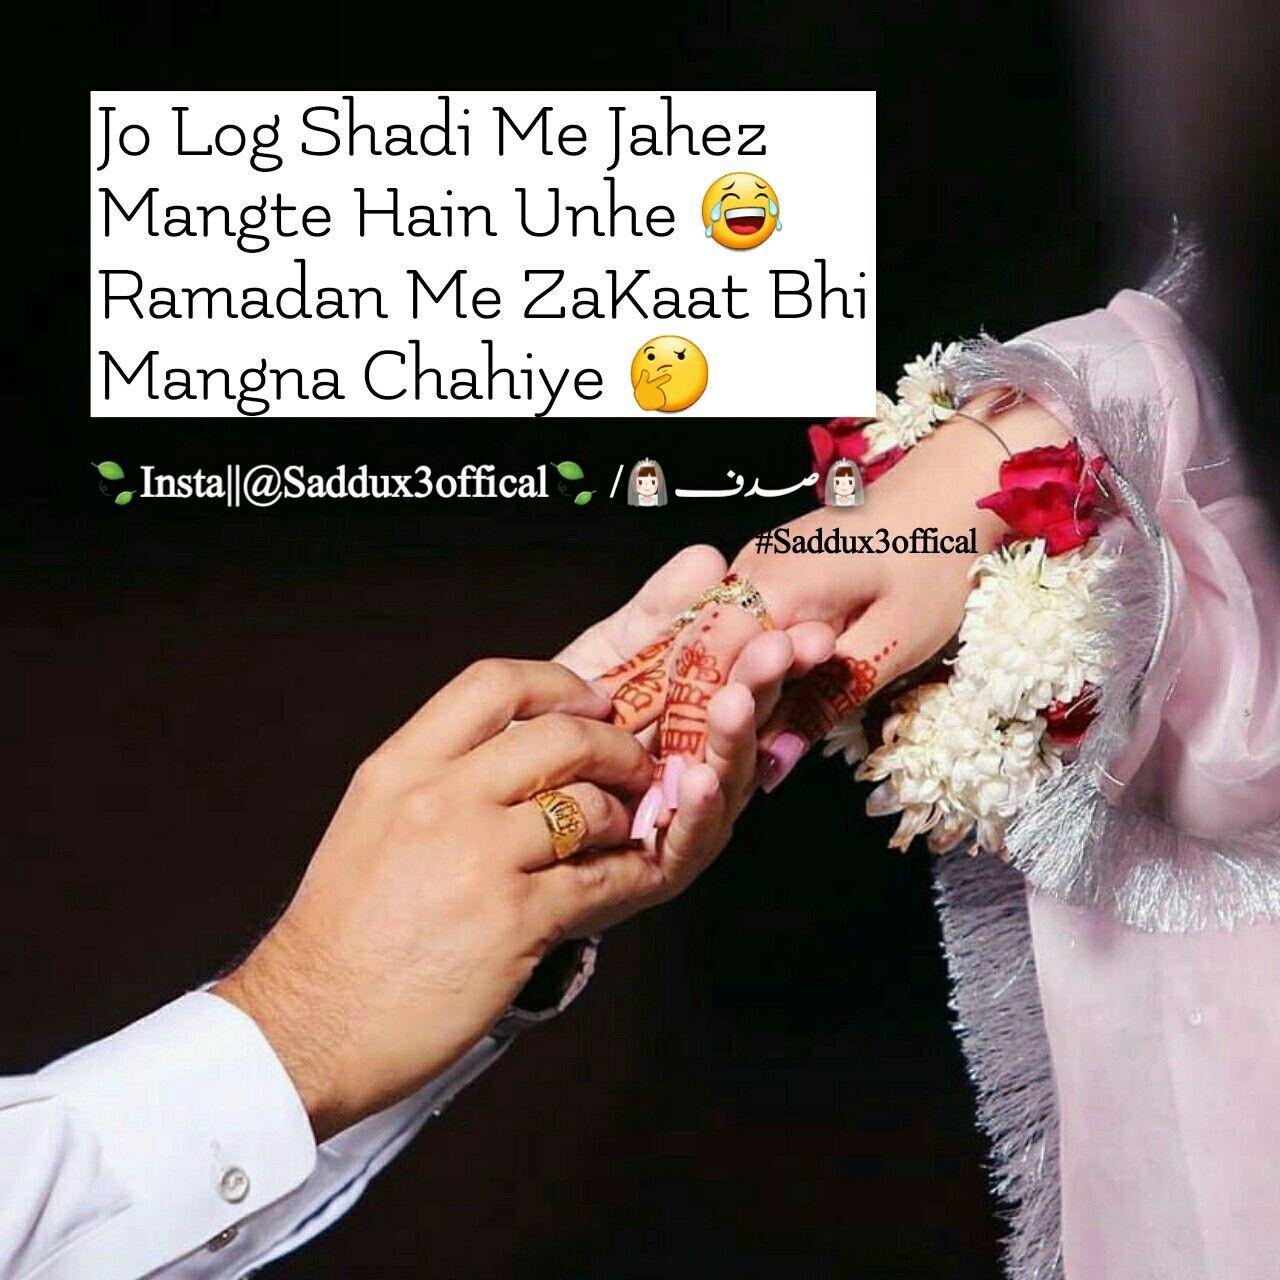 Saddux3offical Keepsupporting Keeploving Zakat Beggars Shadi Jahez Ramdan Funny Girl Quotes Cool Words Motivatinal Quotes